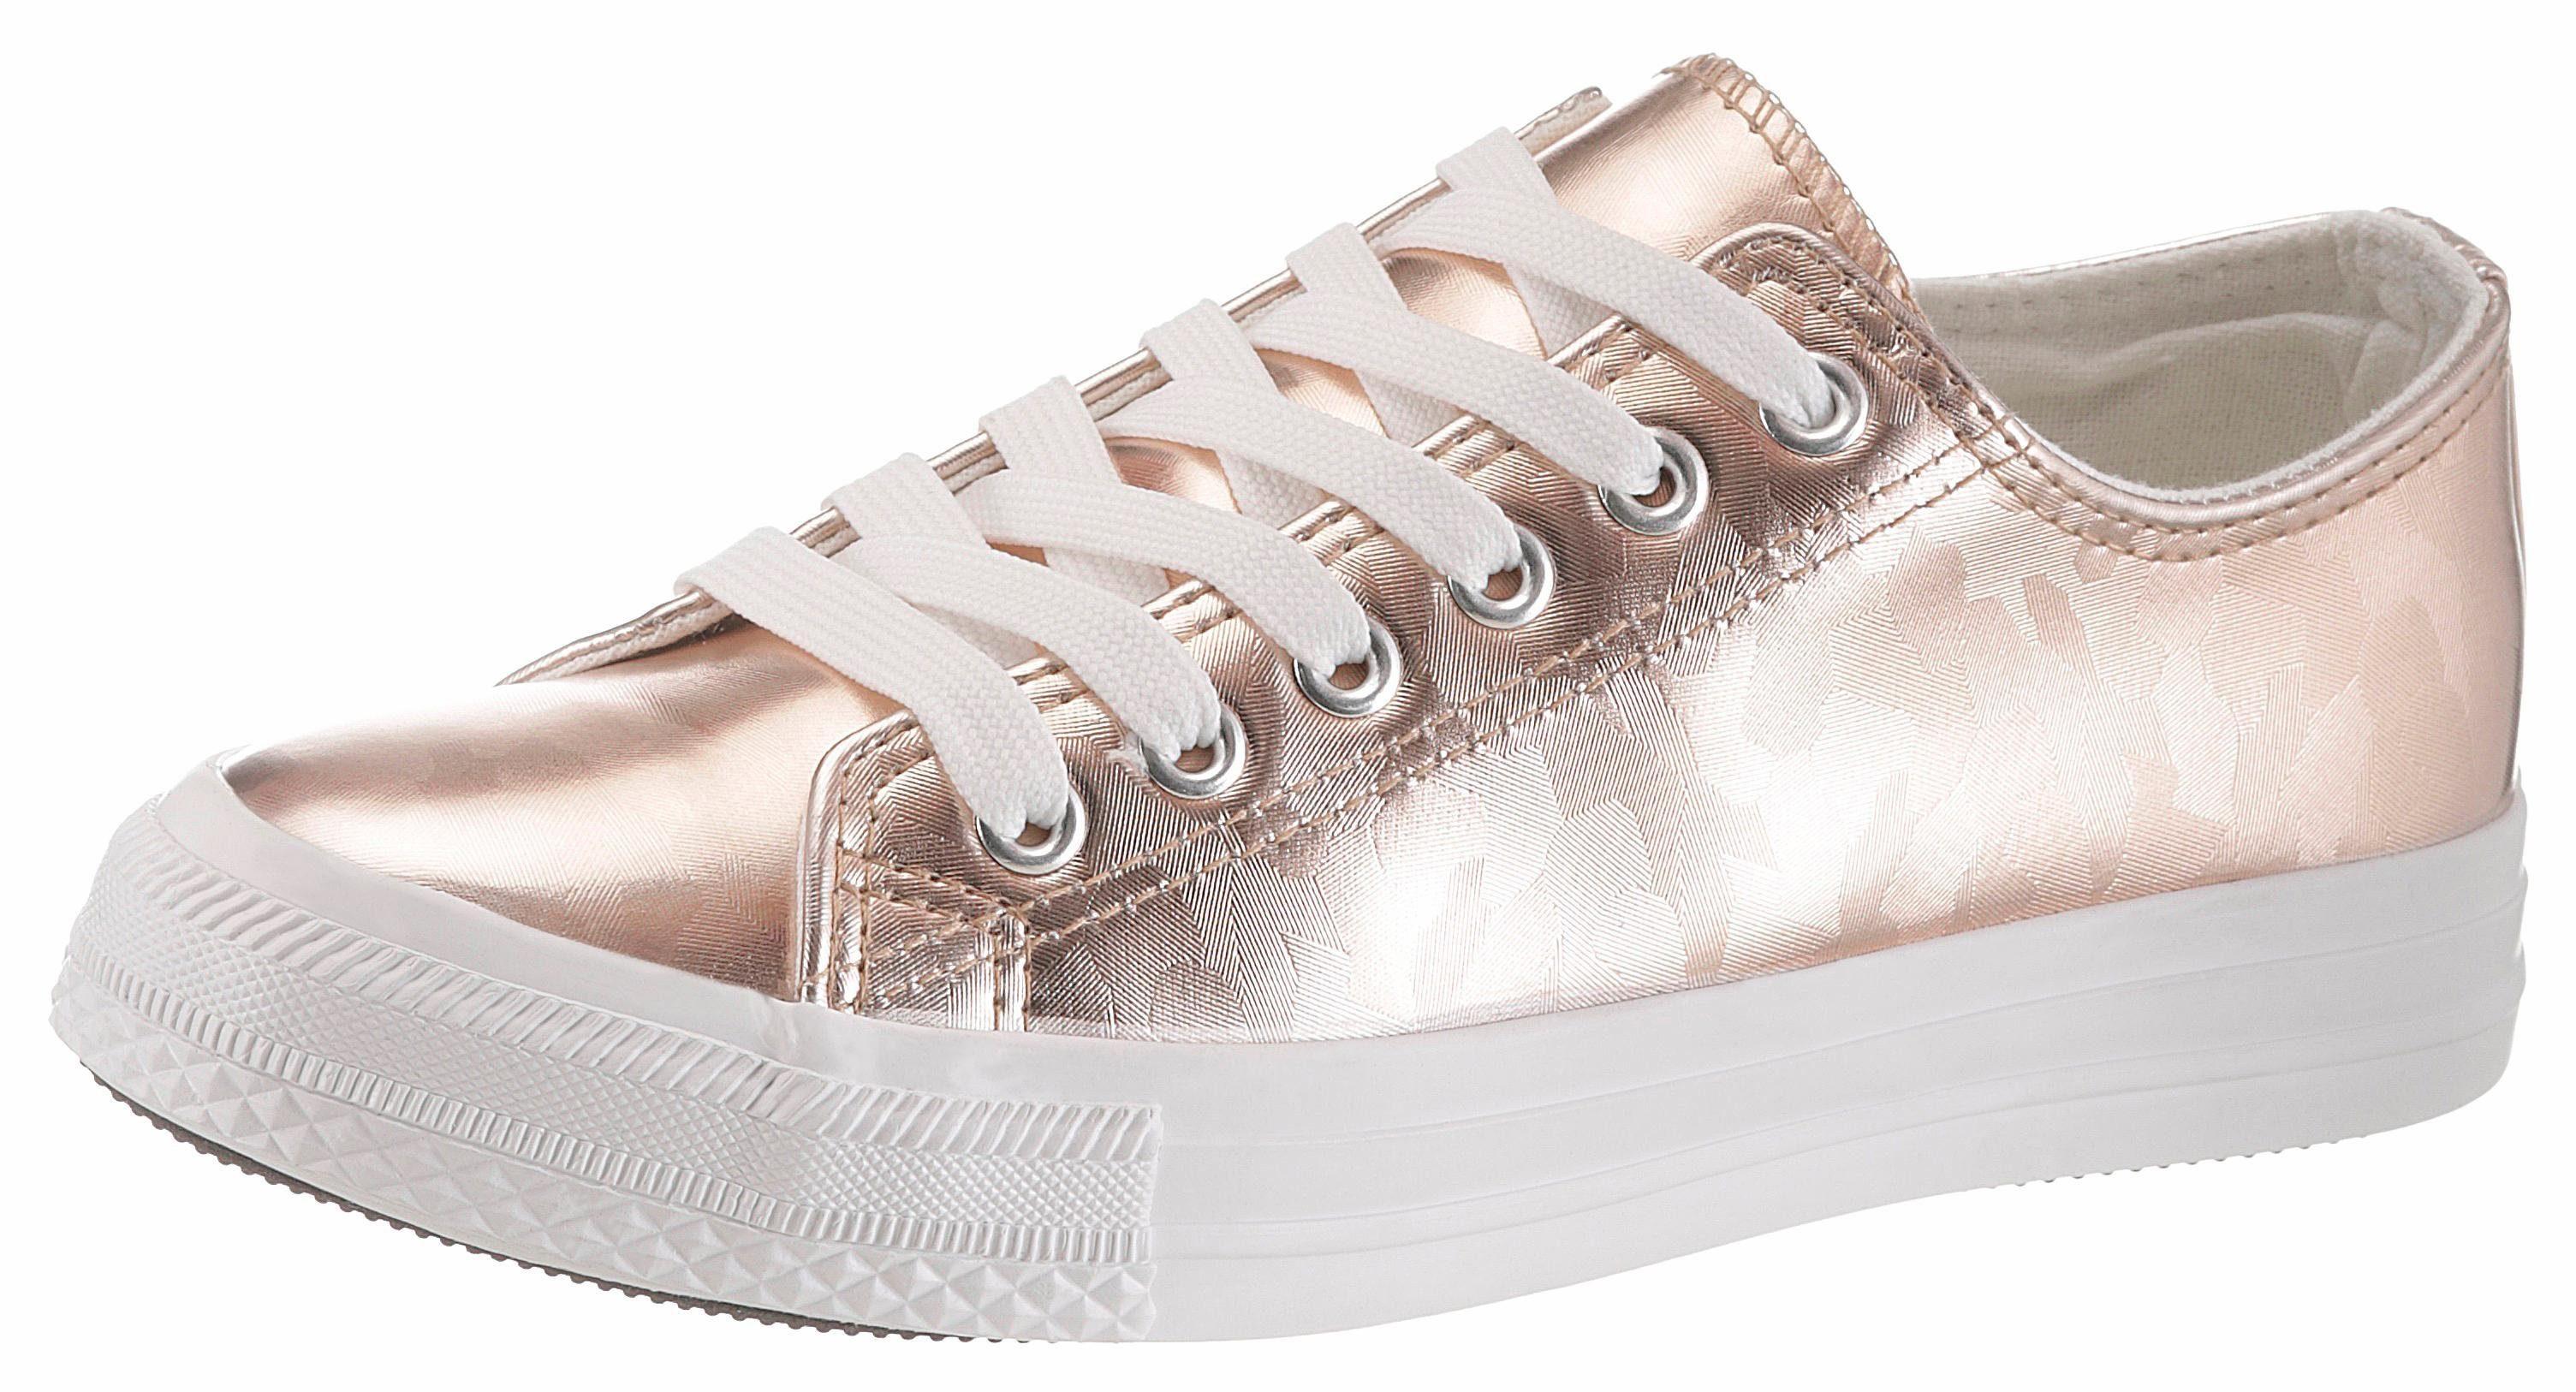 HaILYS »Vicky« Sneaker, im Metallic-Look, rosa, roségoldfarben